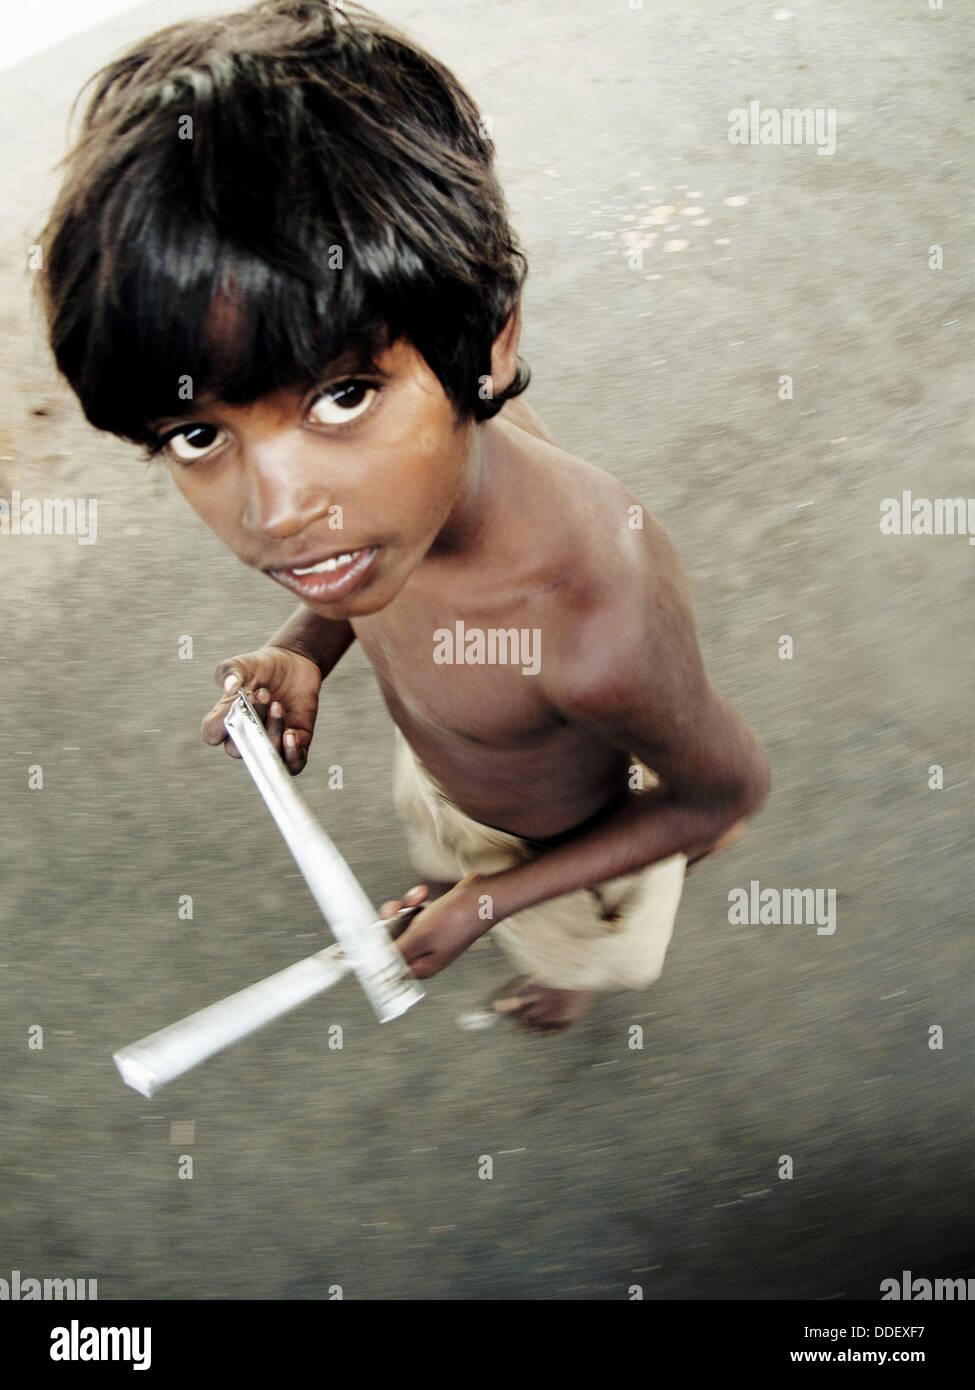 Untouchable boy in a station, Mumbai, Maharashtra, India Stock Photo